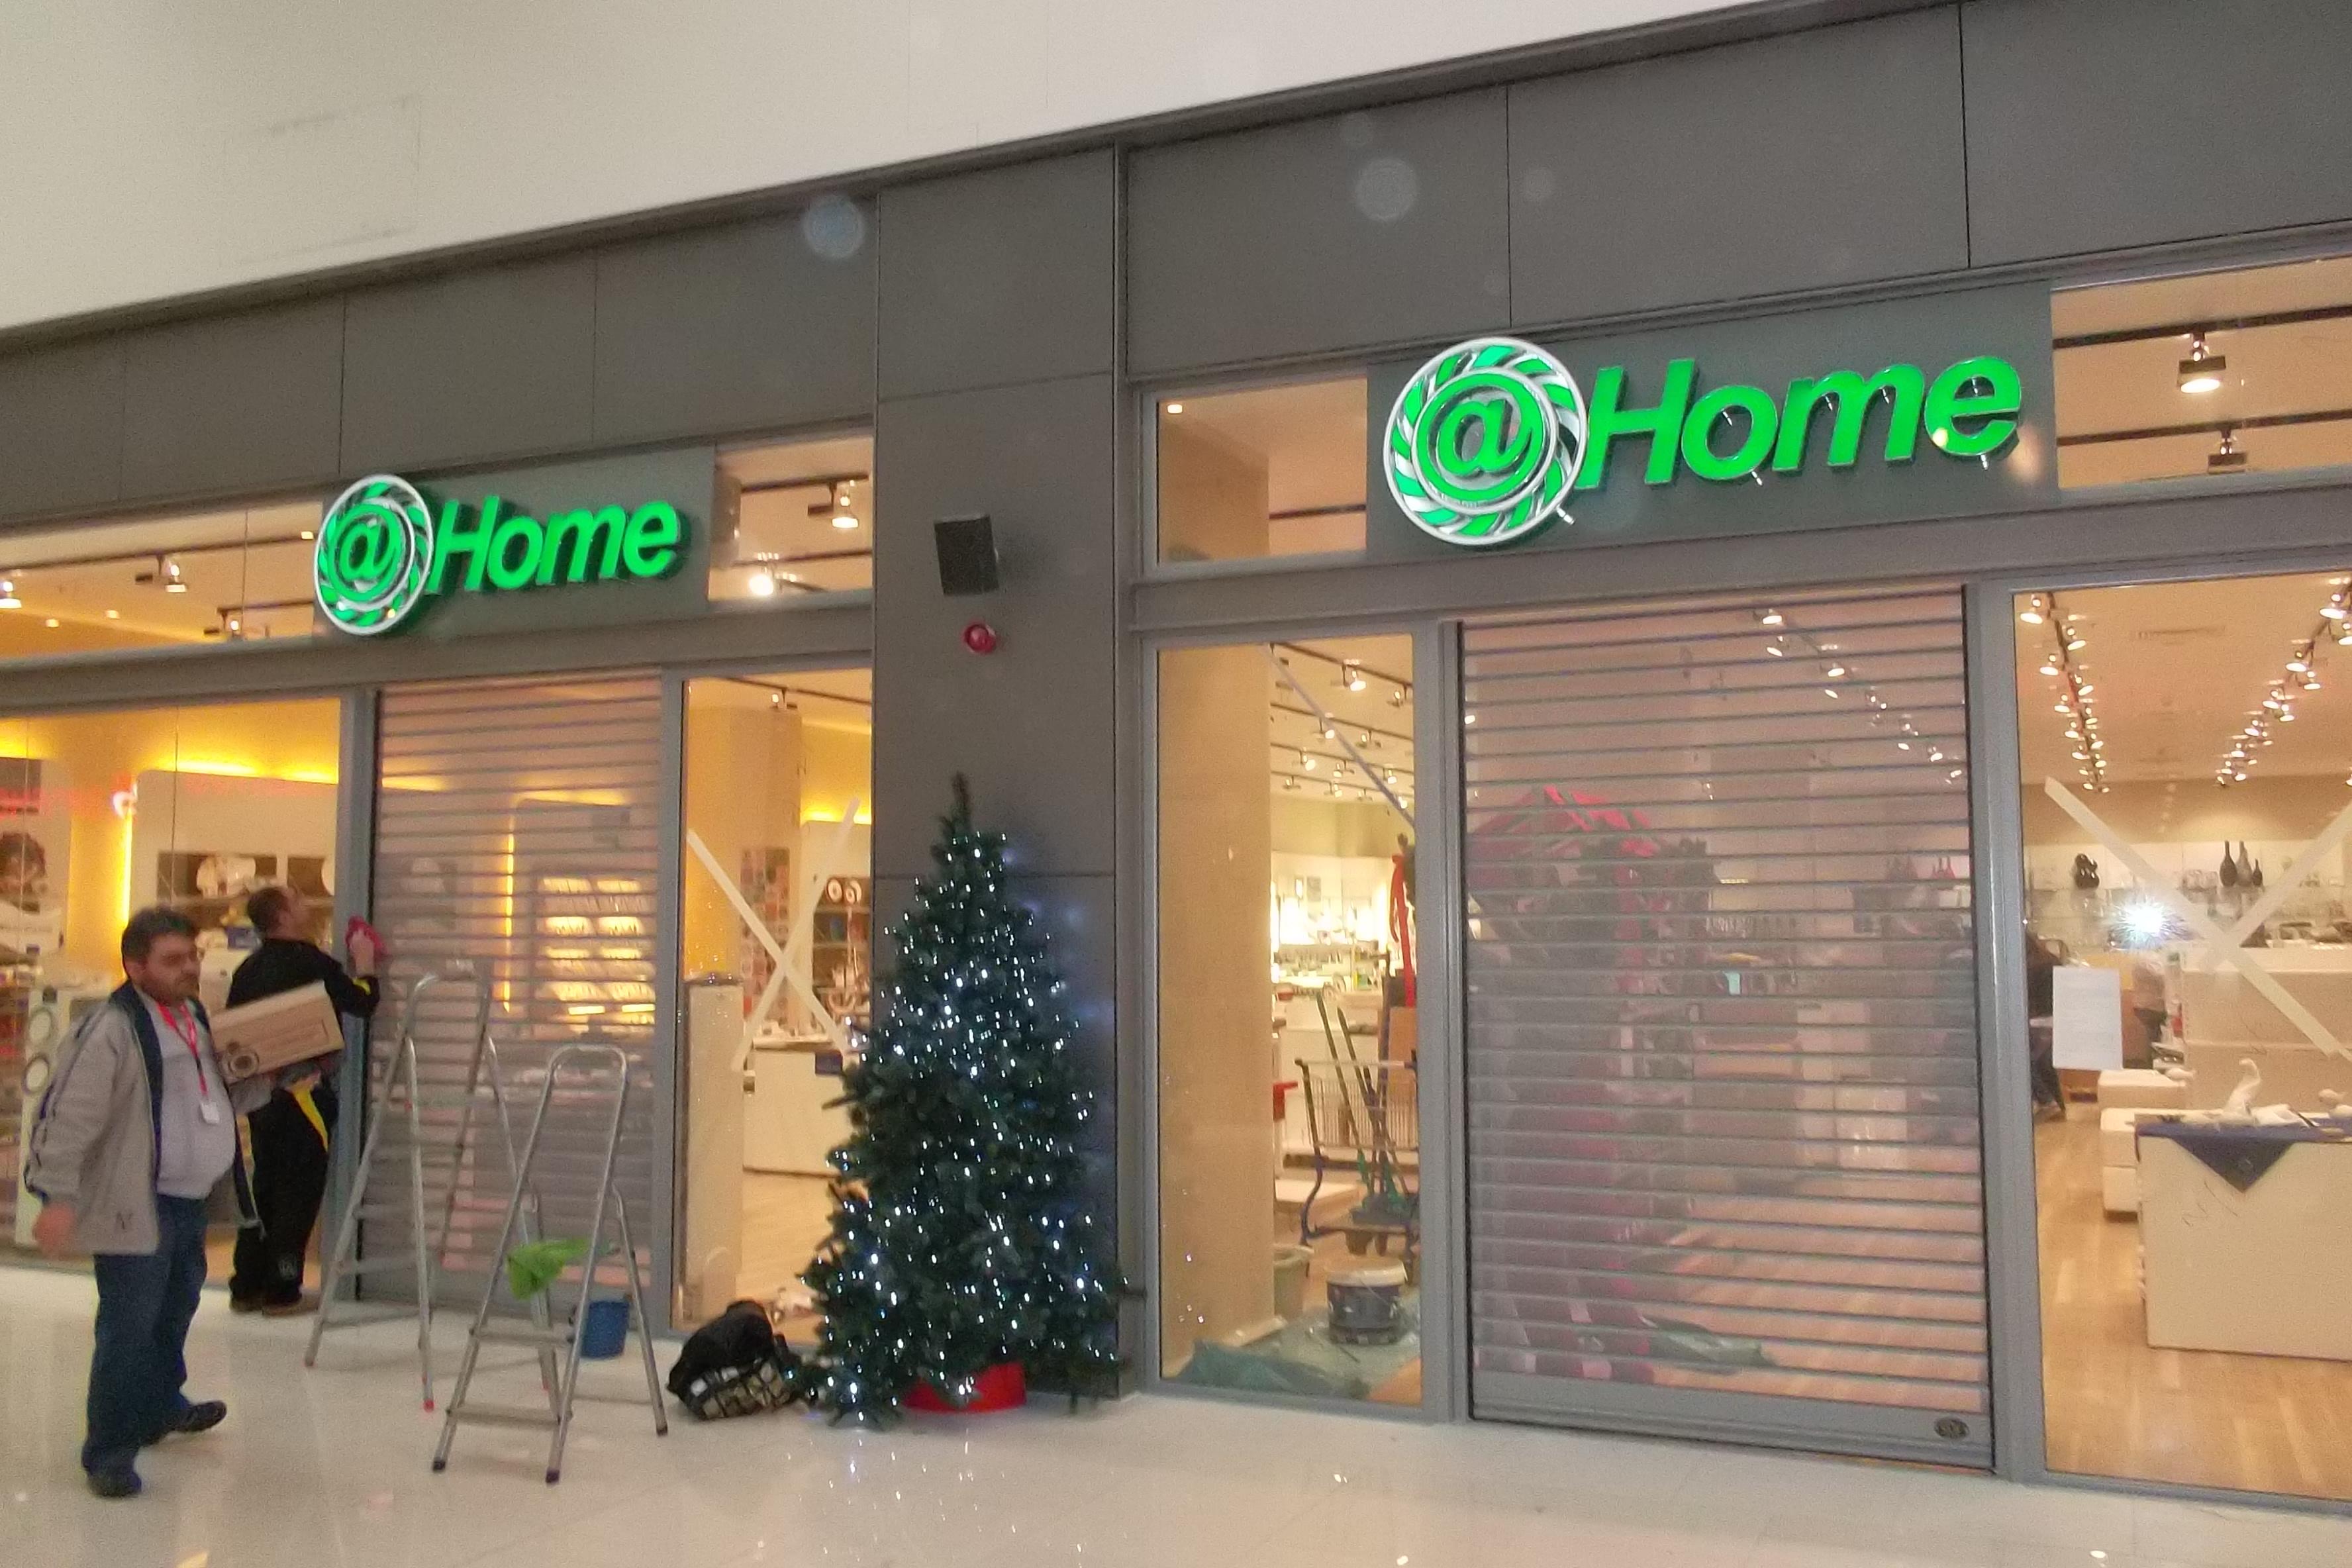 3Д лого и букви @Home